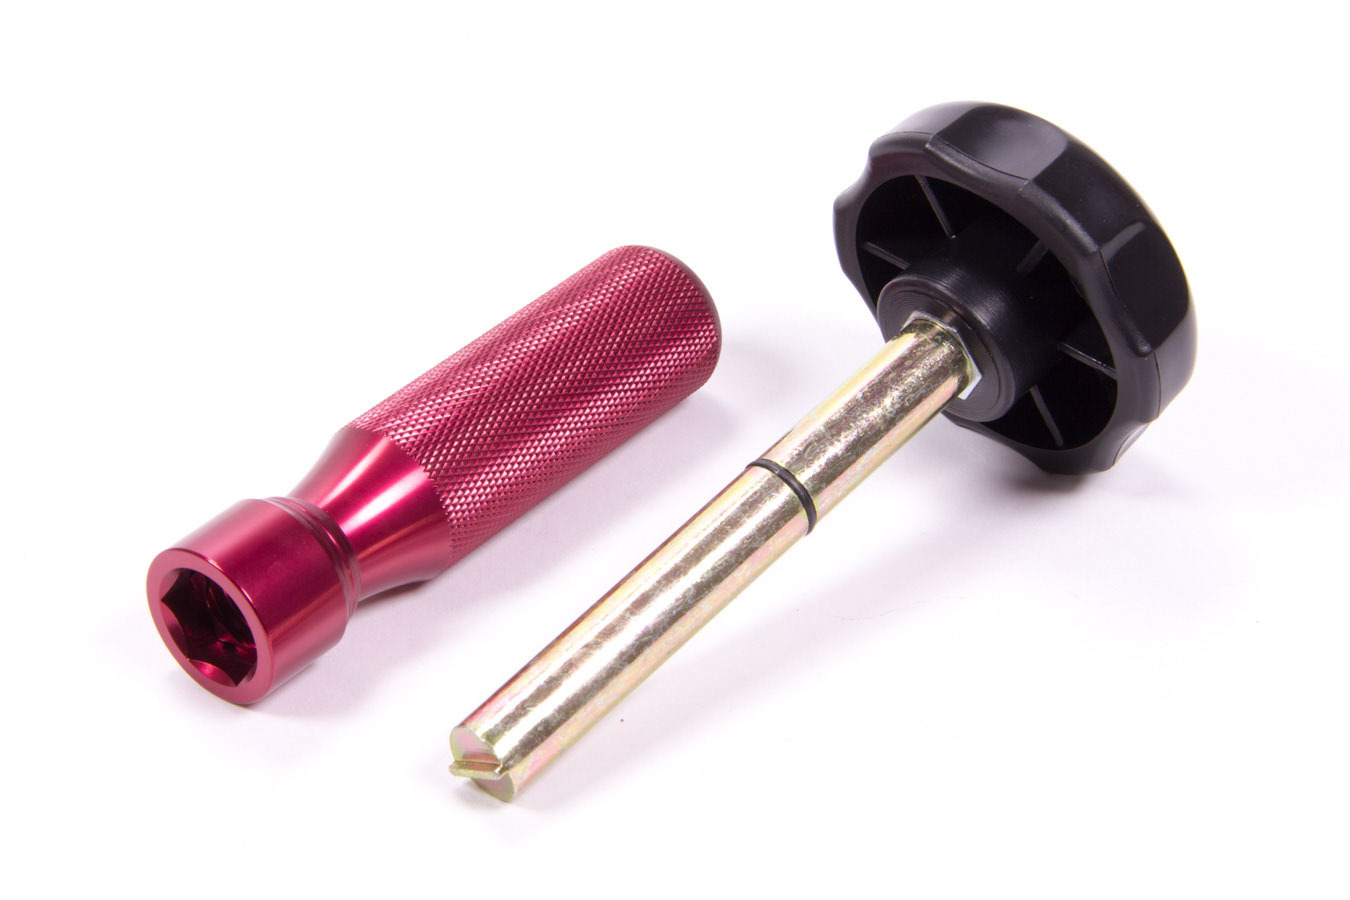 Proform 67443 Float Tool, Aluminum, Black / Red Anodized, Each